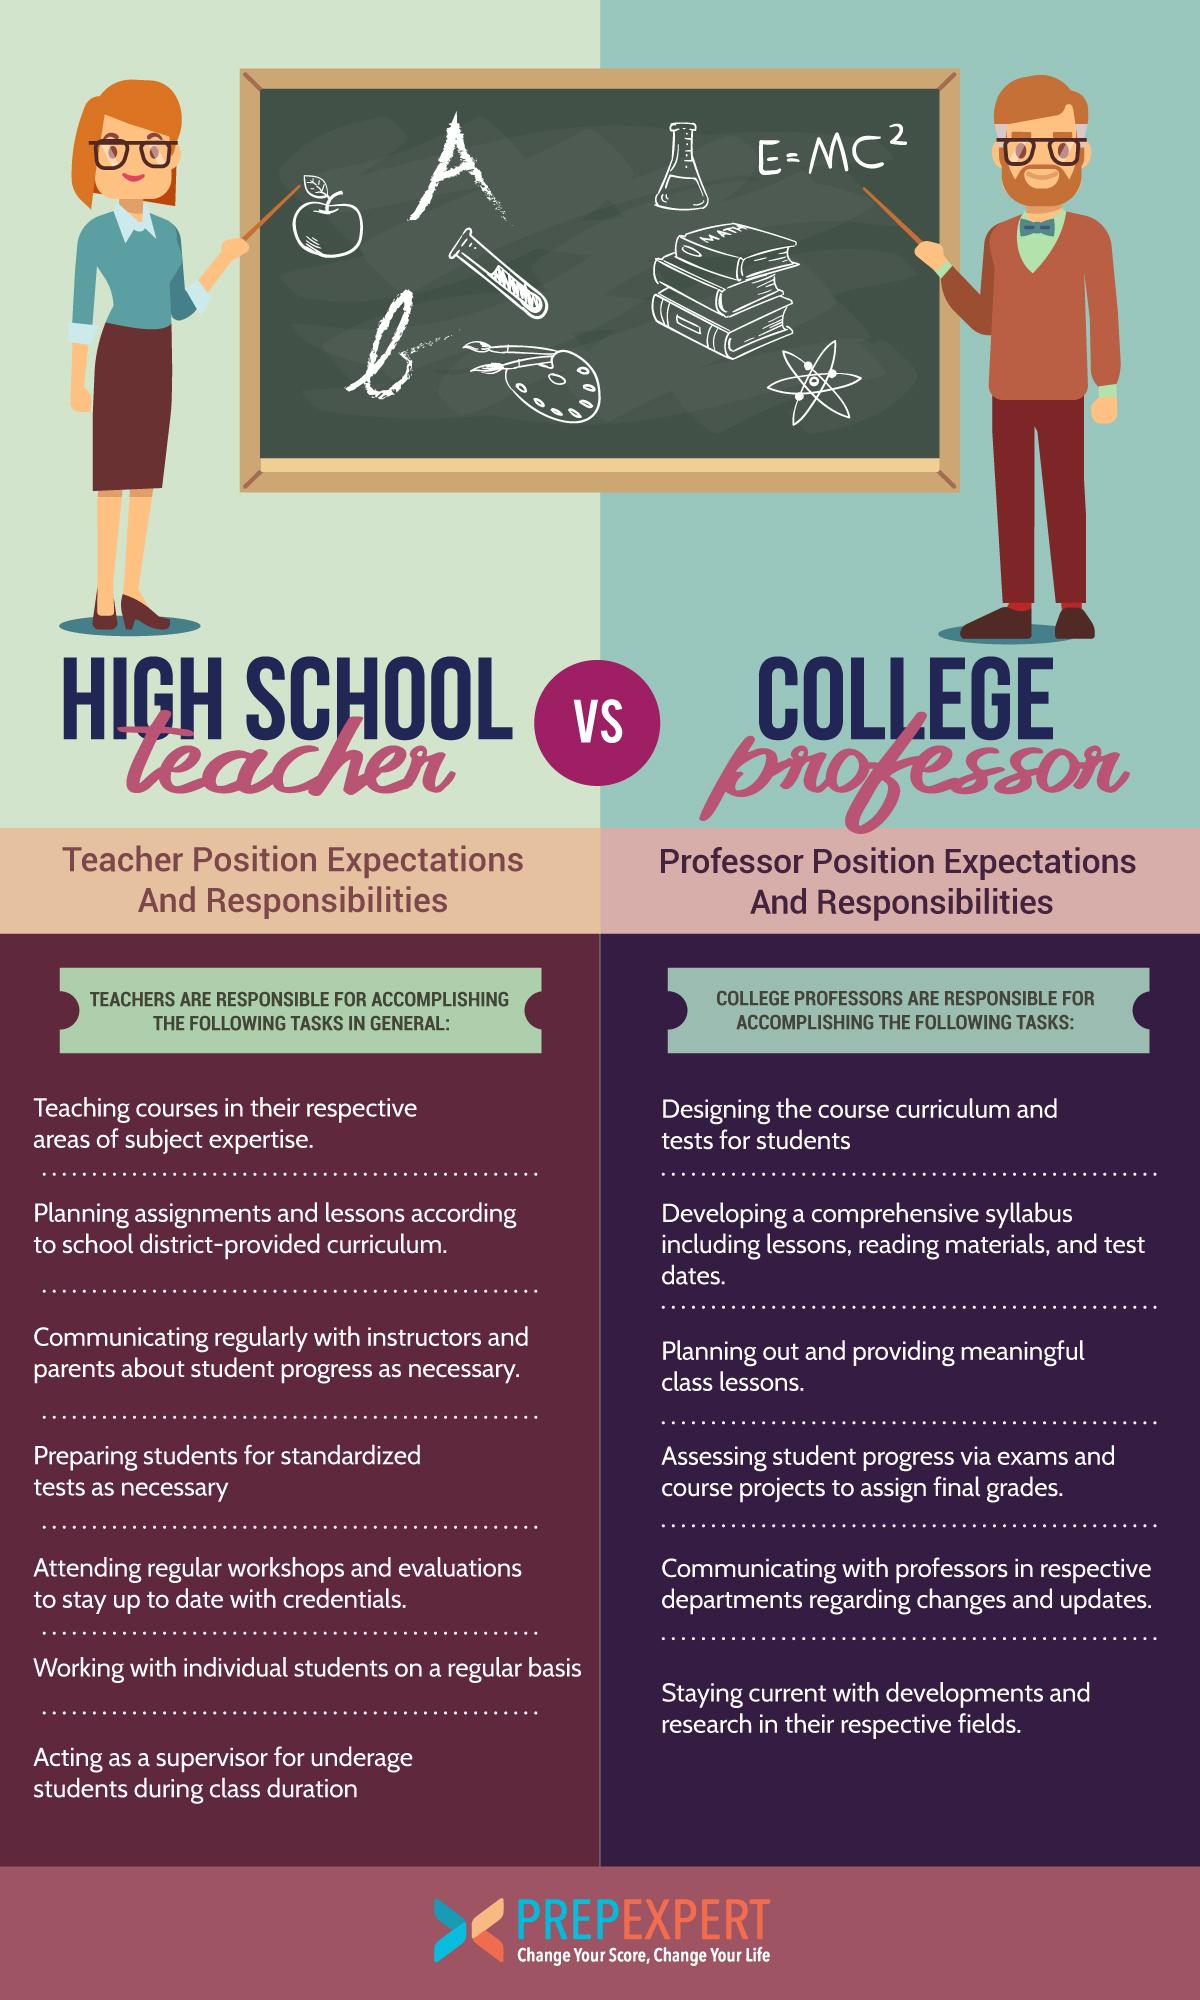 High School Teacher Vs College Professor